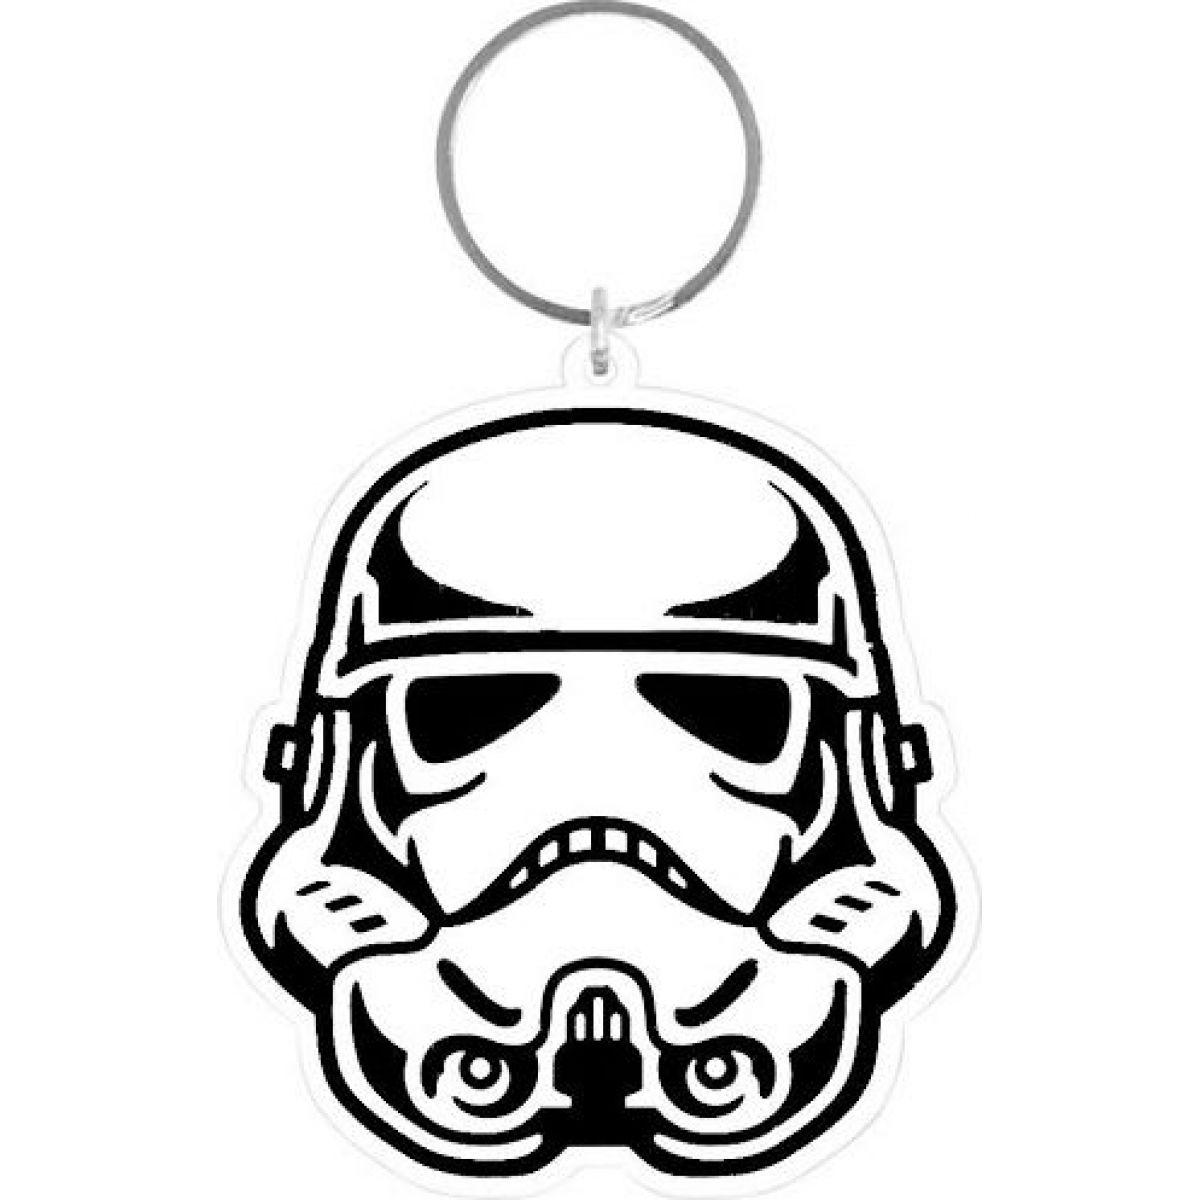 Klíčenka gumová Star Wars Strom Trooper